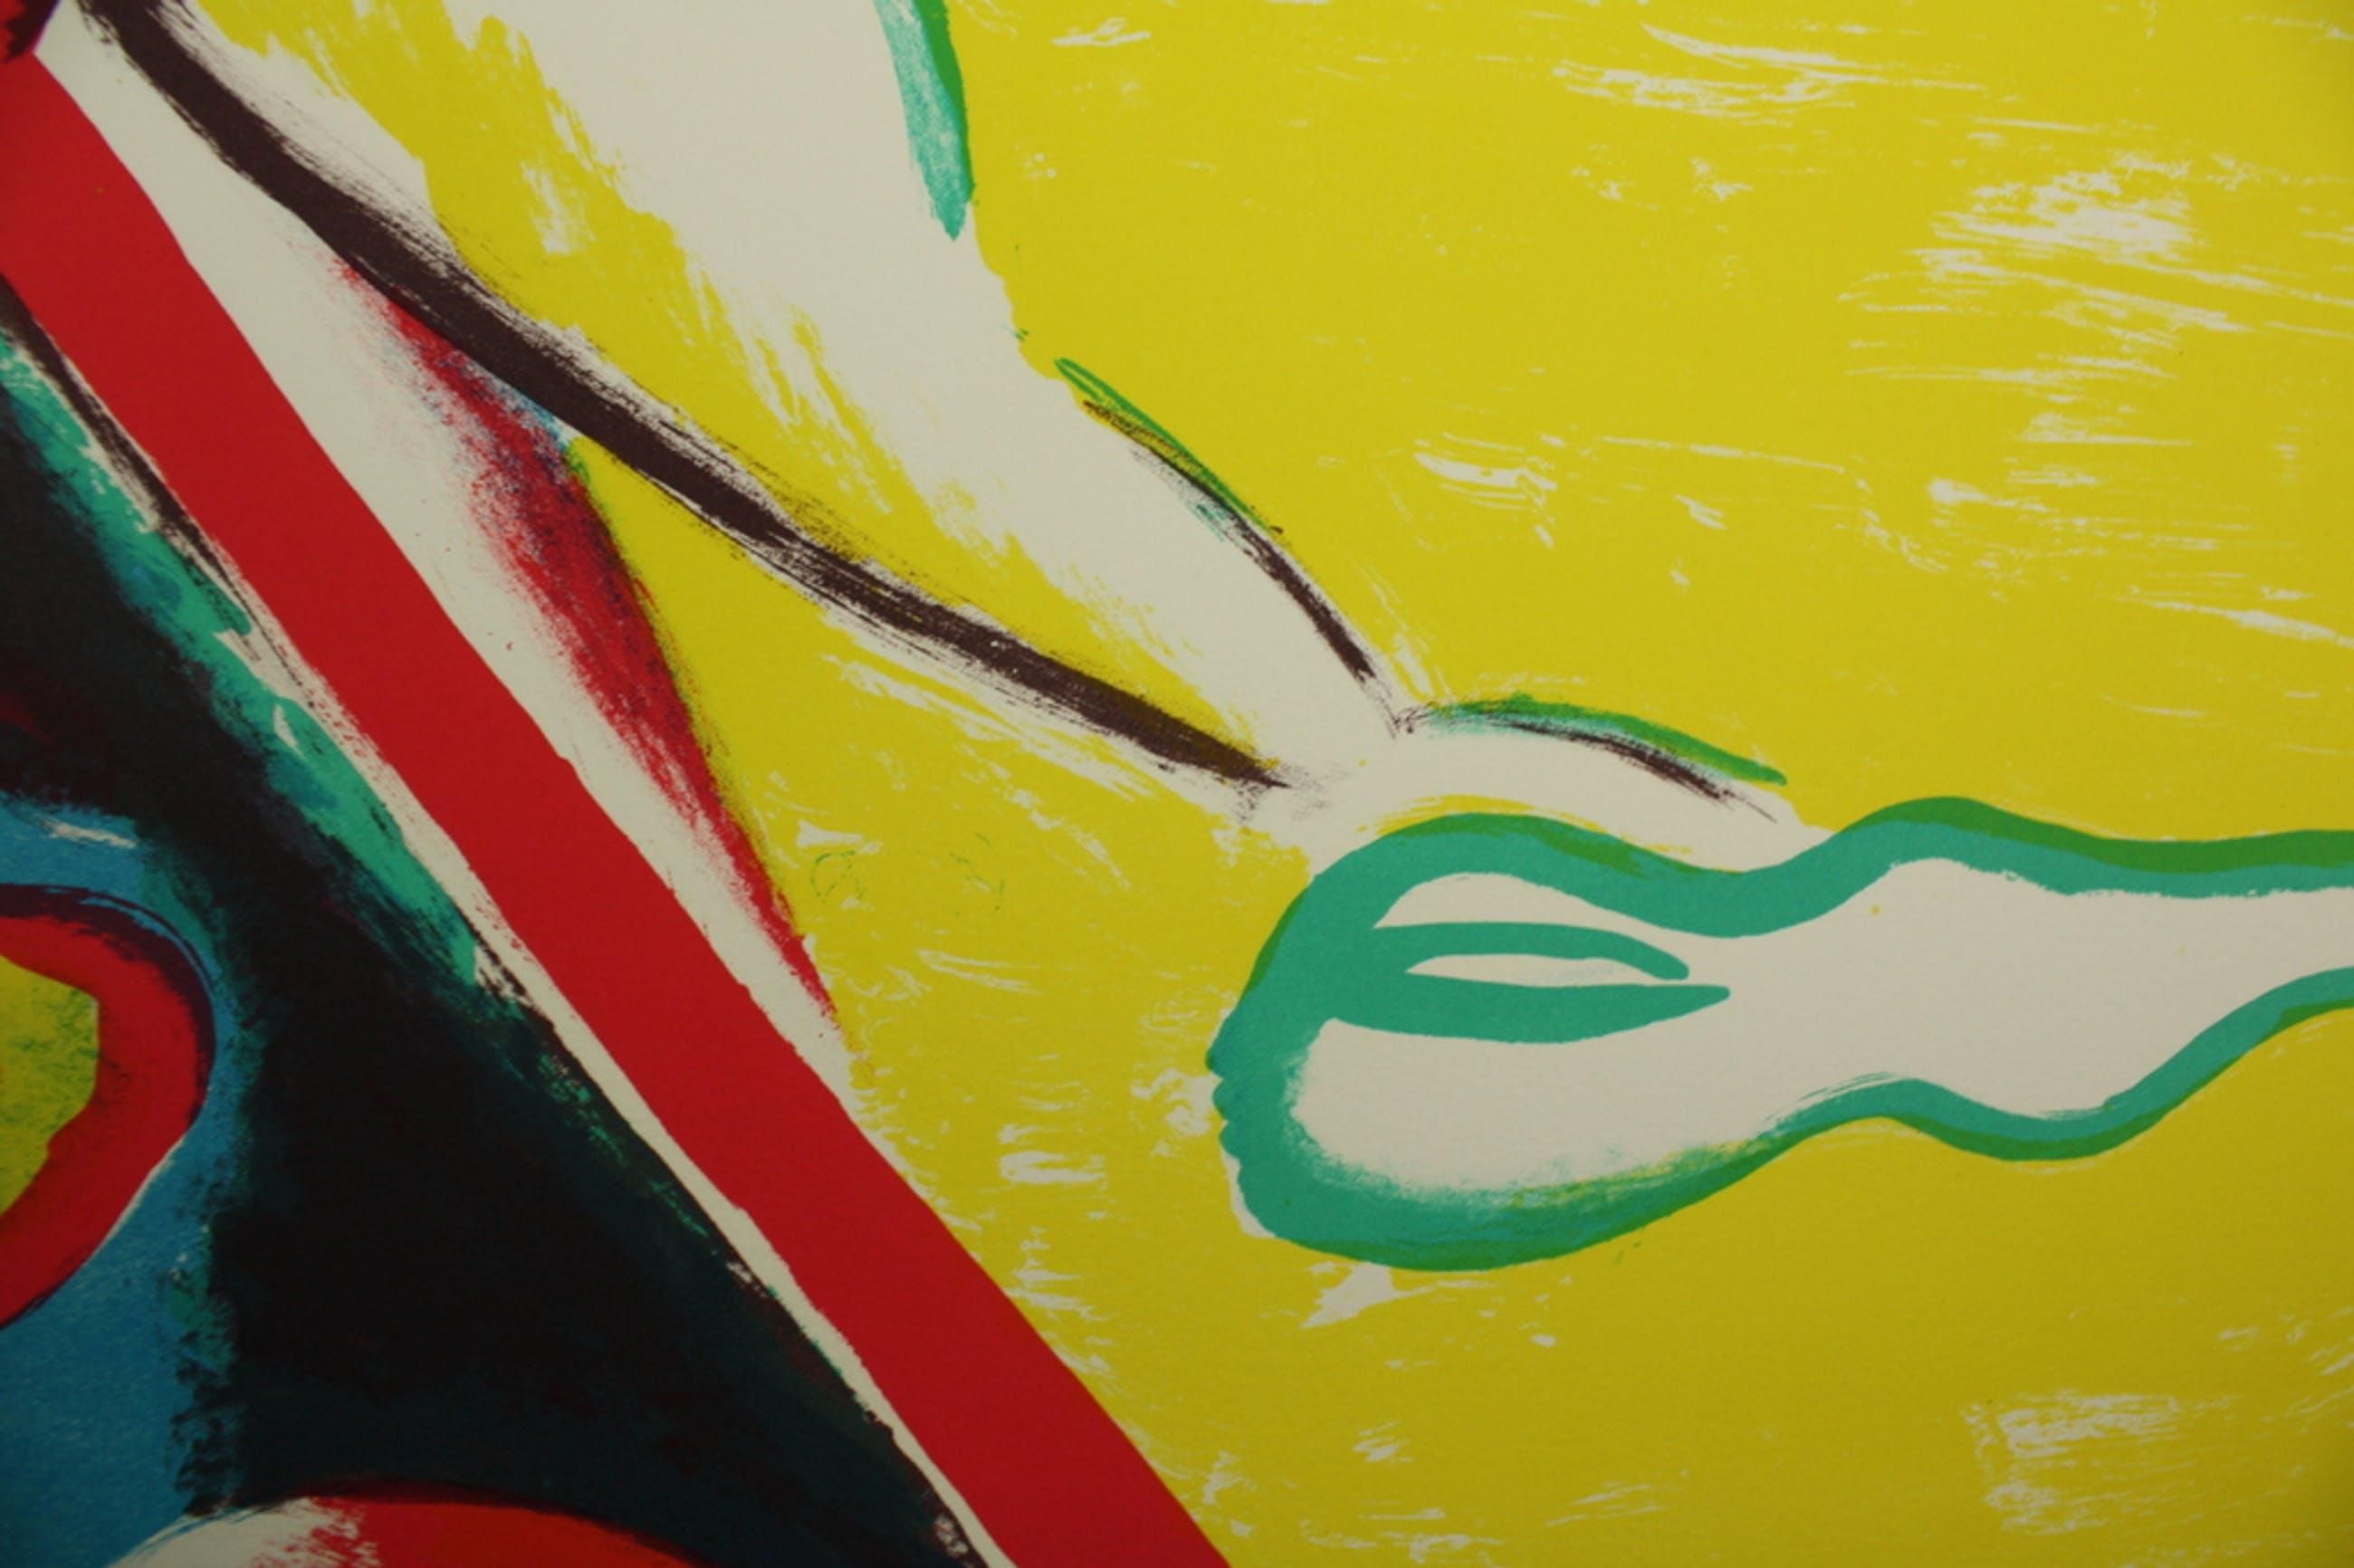 Jorg Remé, kleurenlitho, 1989 kopen? Bied vanaf 49!